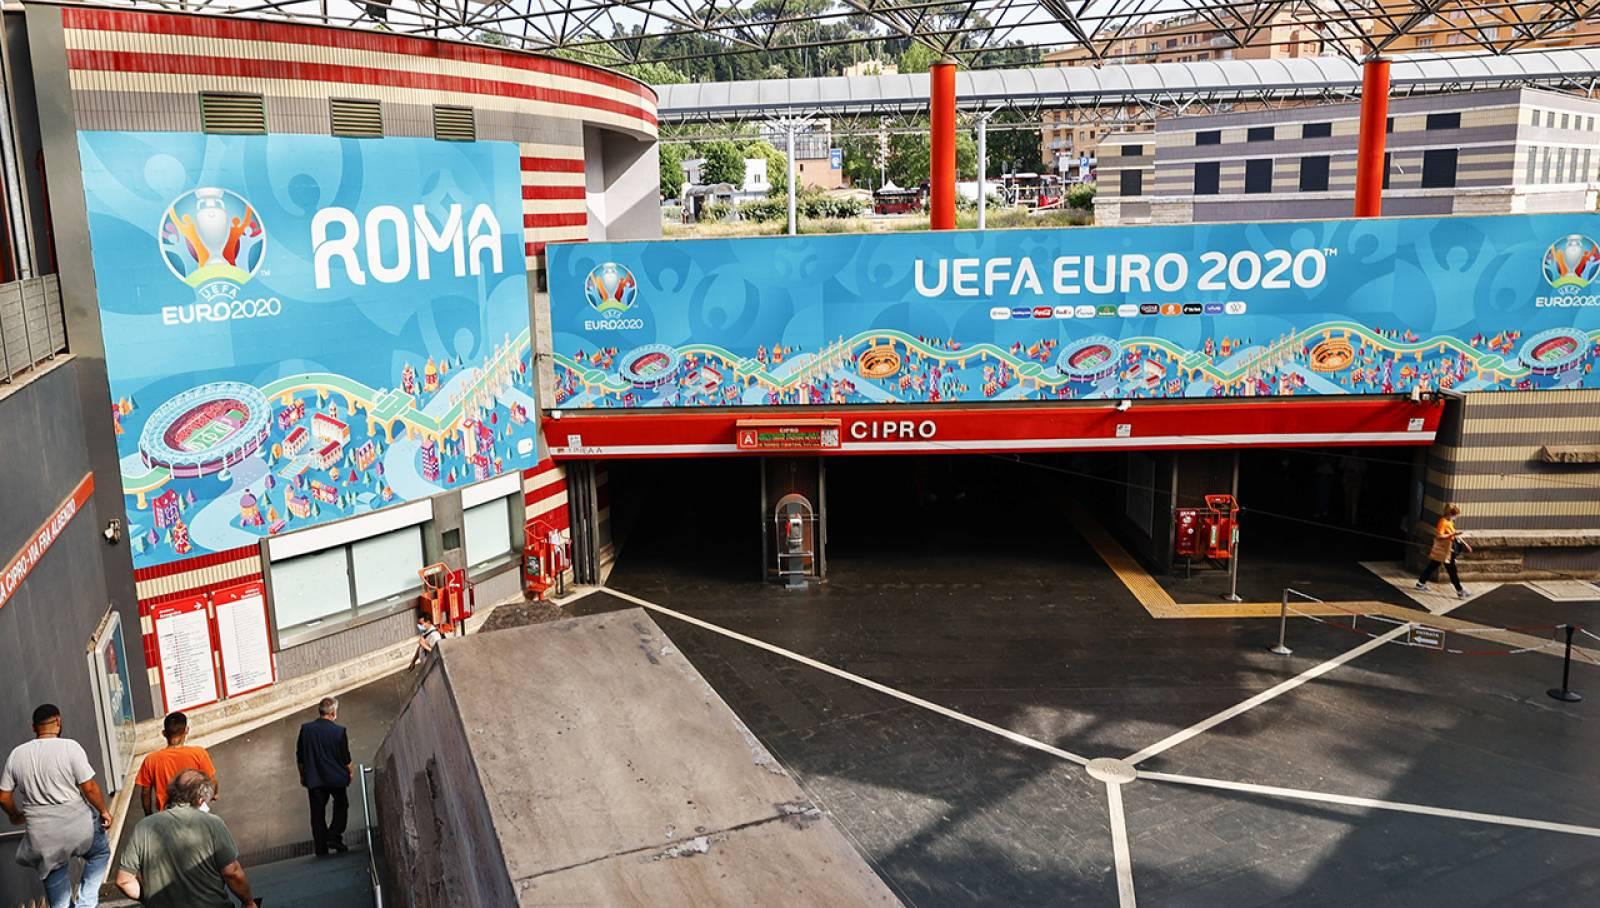 Pubblicità in metropolitana a Roma Cipro Station Domination IGPDecaux per UEFA 2020